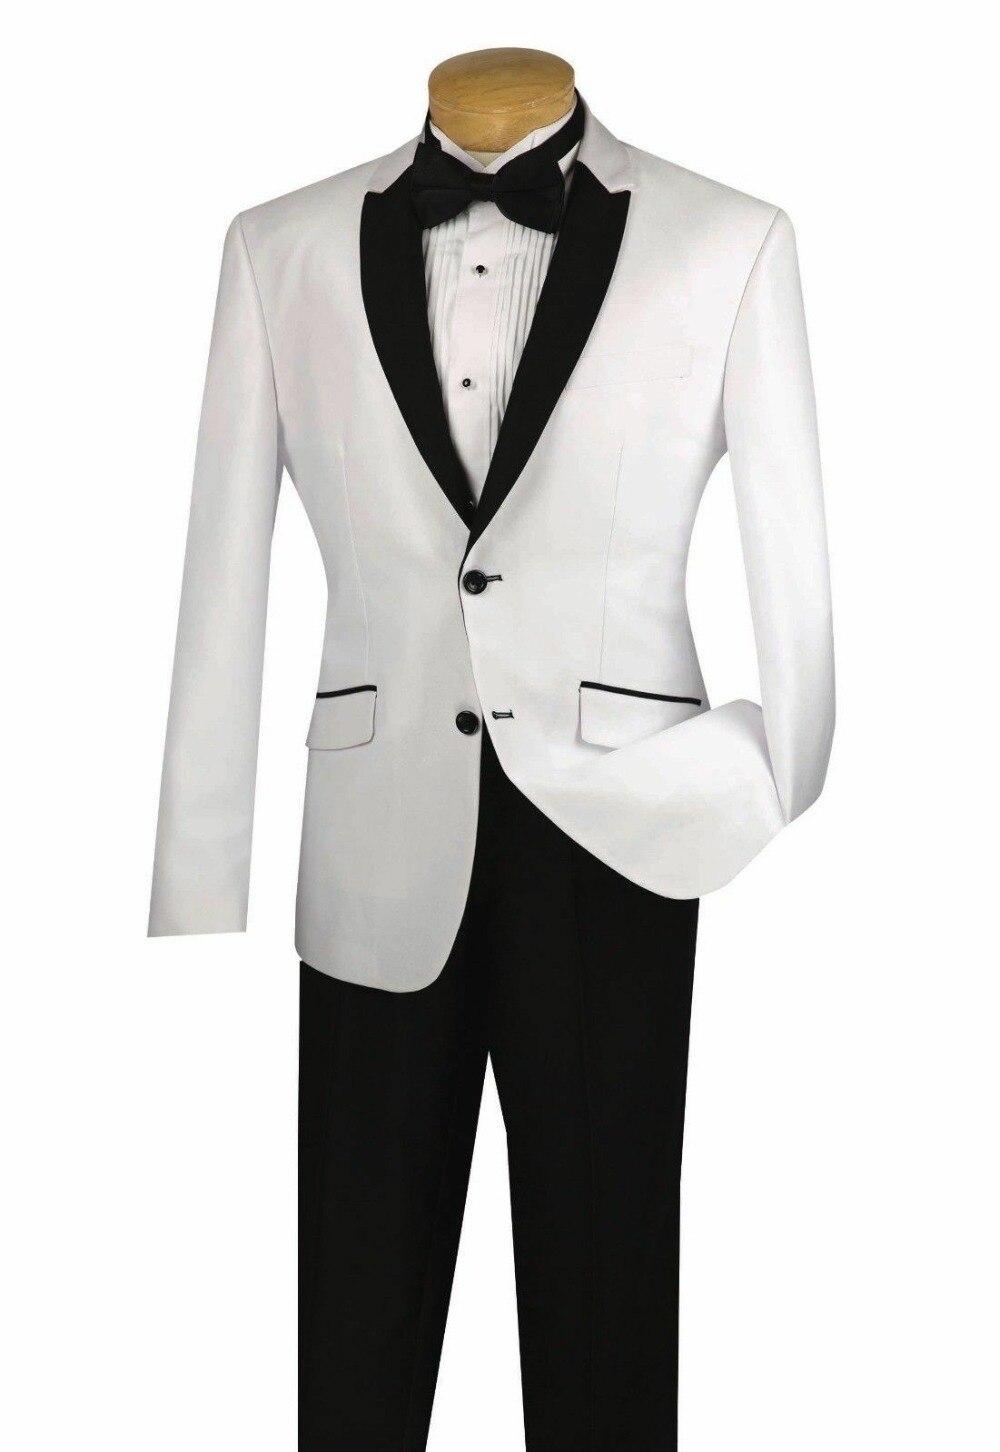 2018 White Groom Tuxedos Men Wedding Suits Jacket Groomsmen Custom in Suits from Men 39 s Clothing